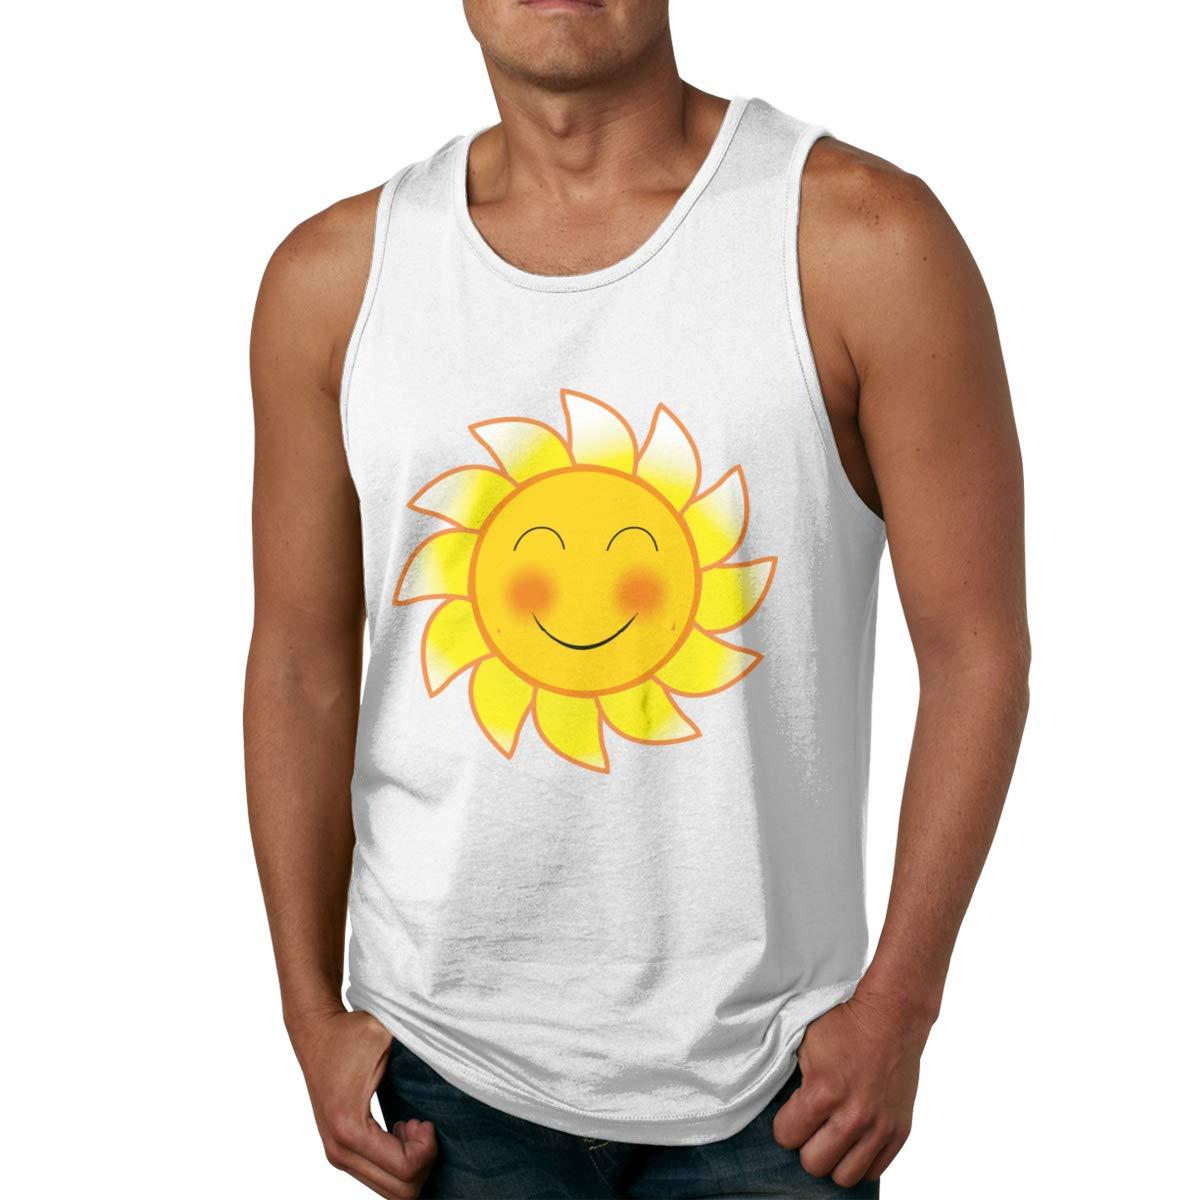 Seuriamin Smile Blushing Sun Expression S Fashion Hiking Sleeveless Tank Top Ts Shirts